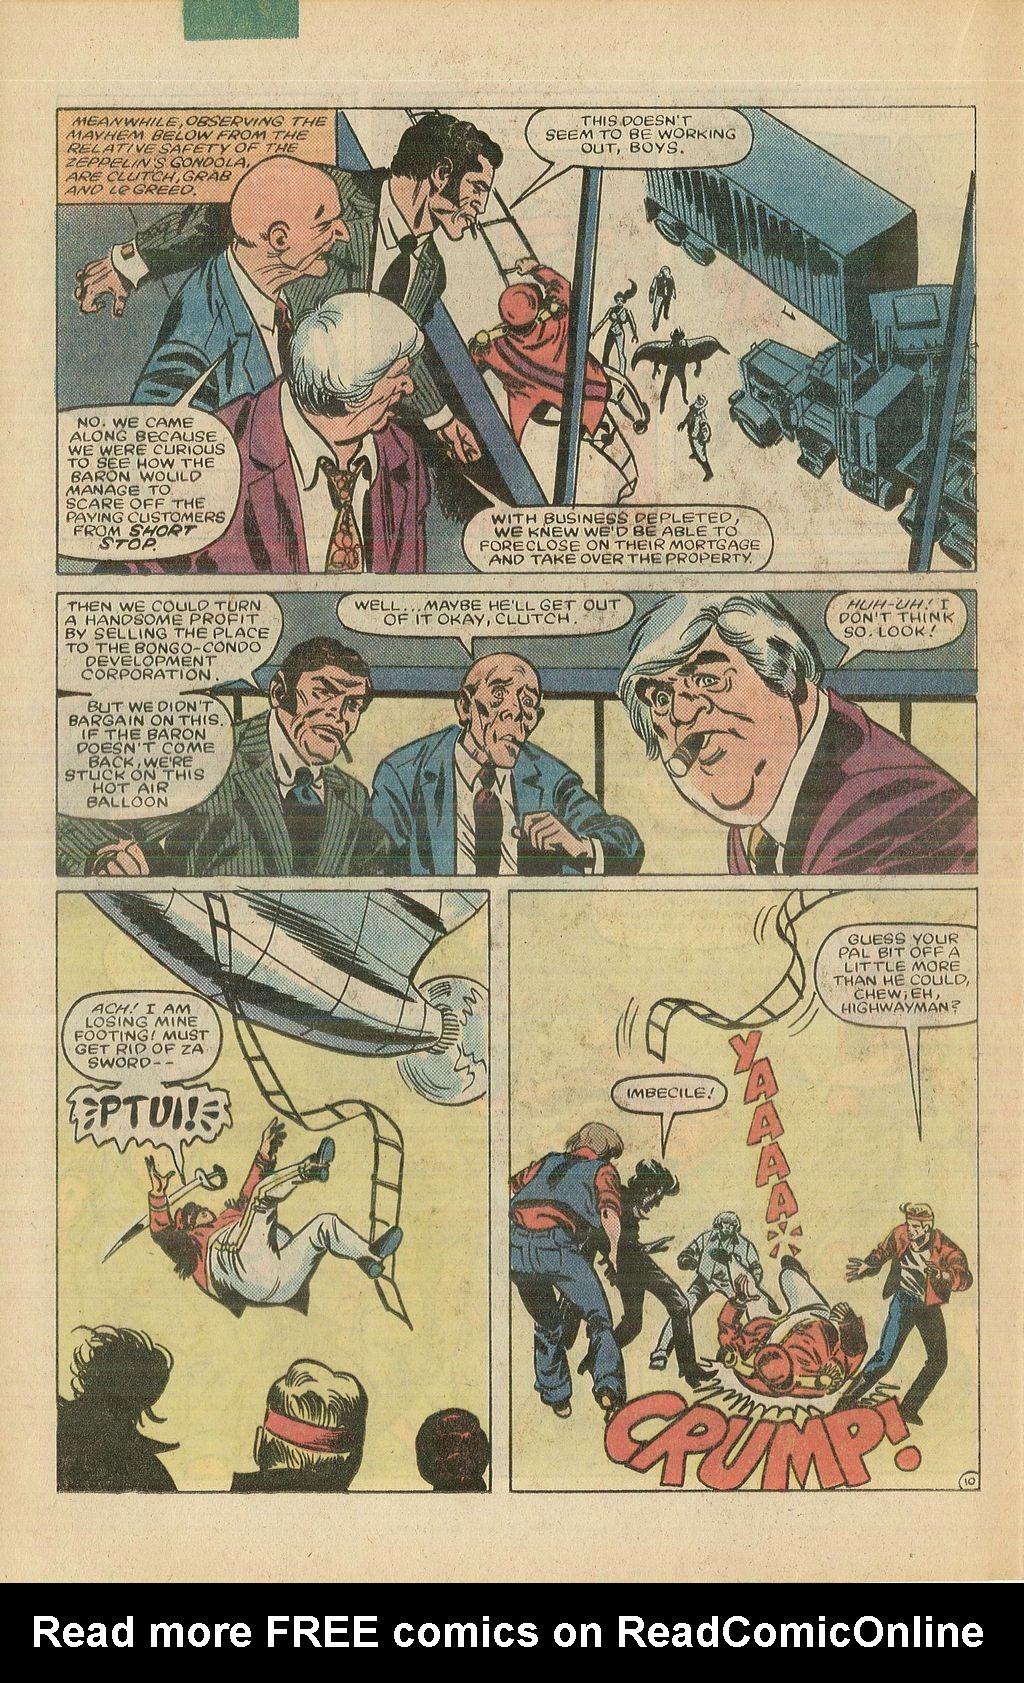 Read online U.S. 1 comic -  Issue #10 - 16